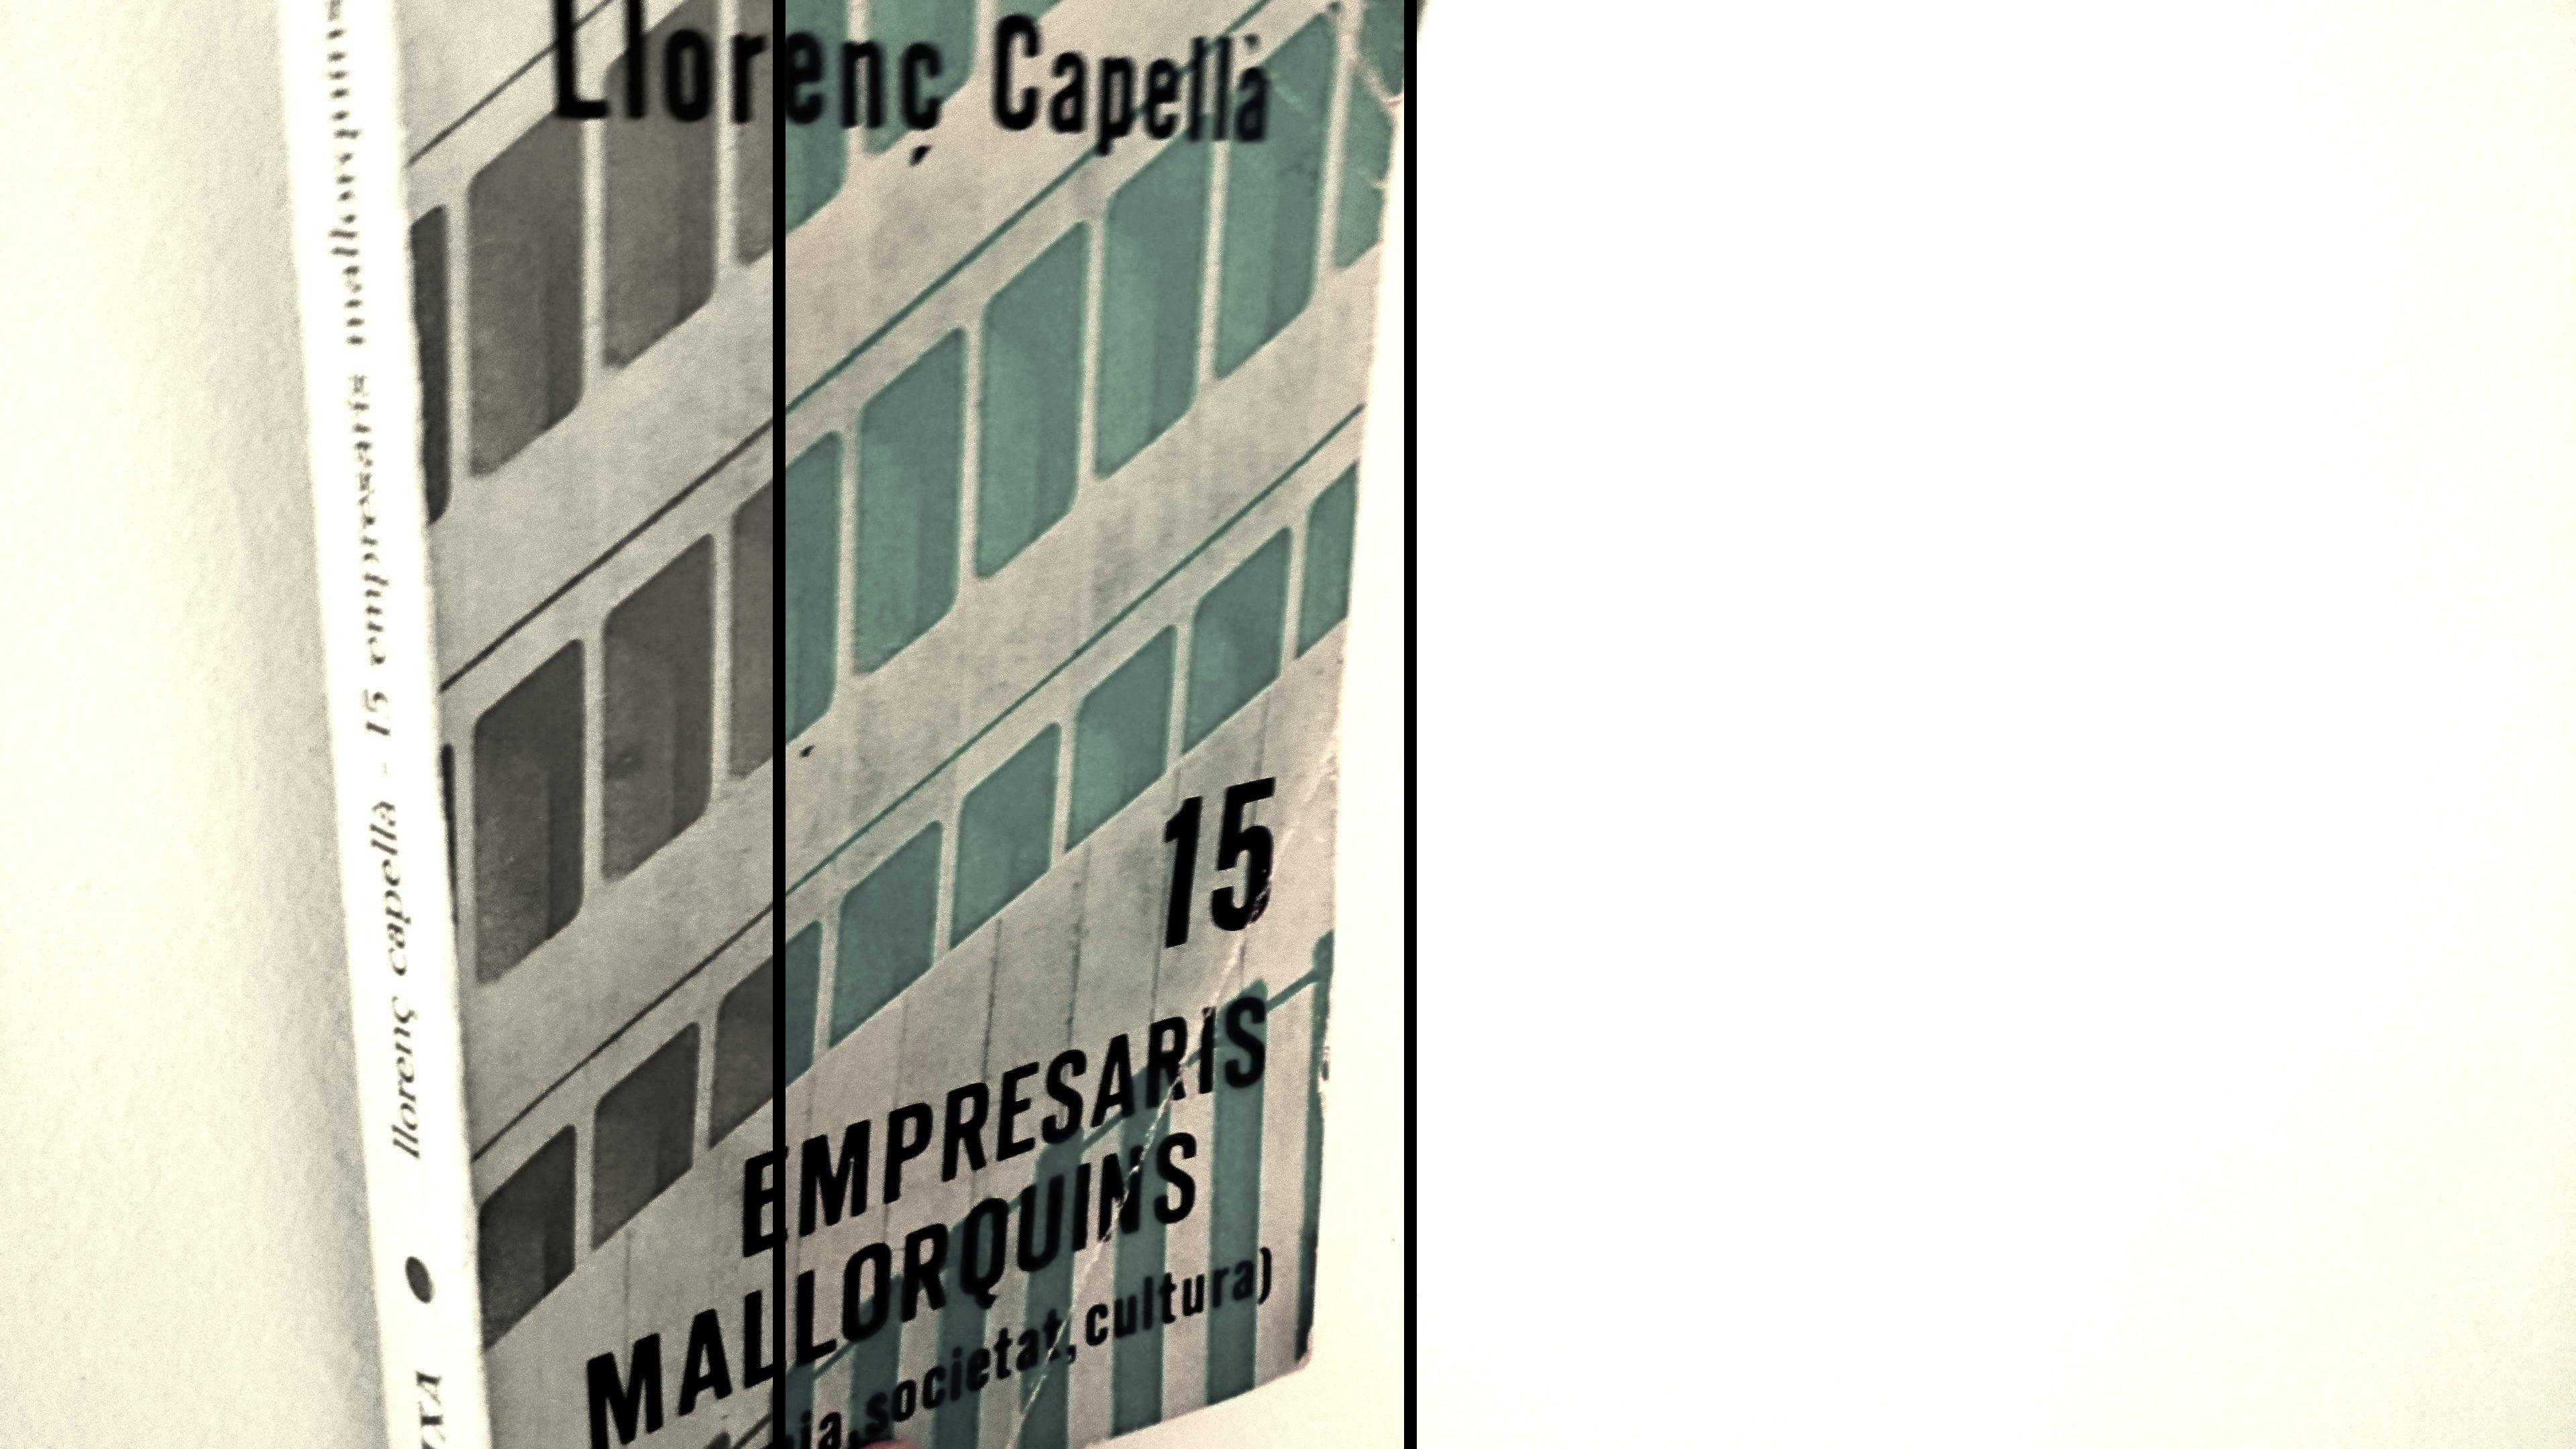 Empresarios mallorquines en la época de Franco (II)